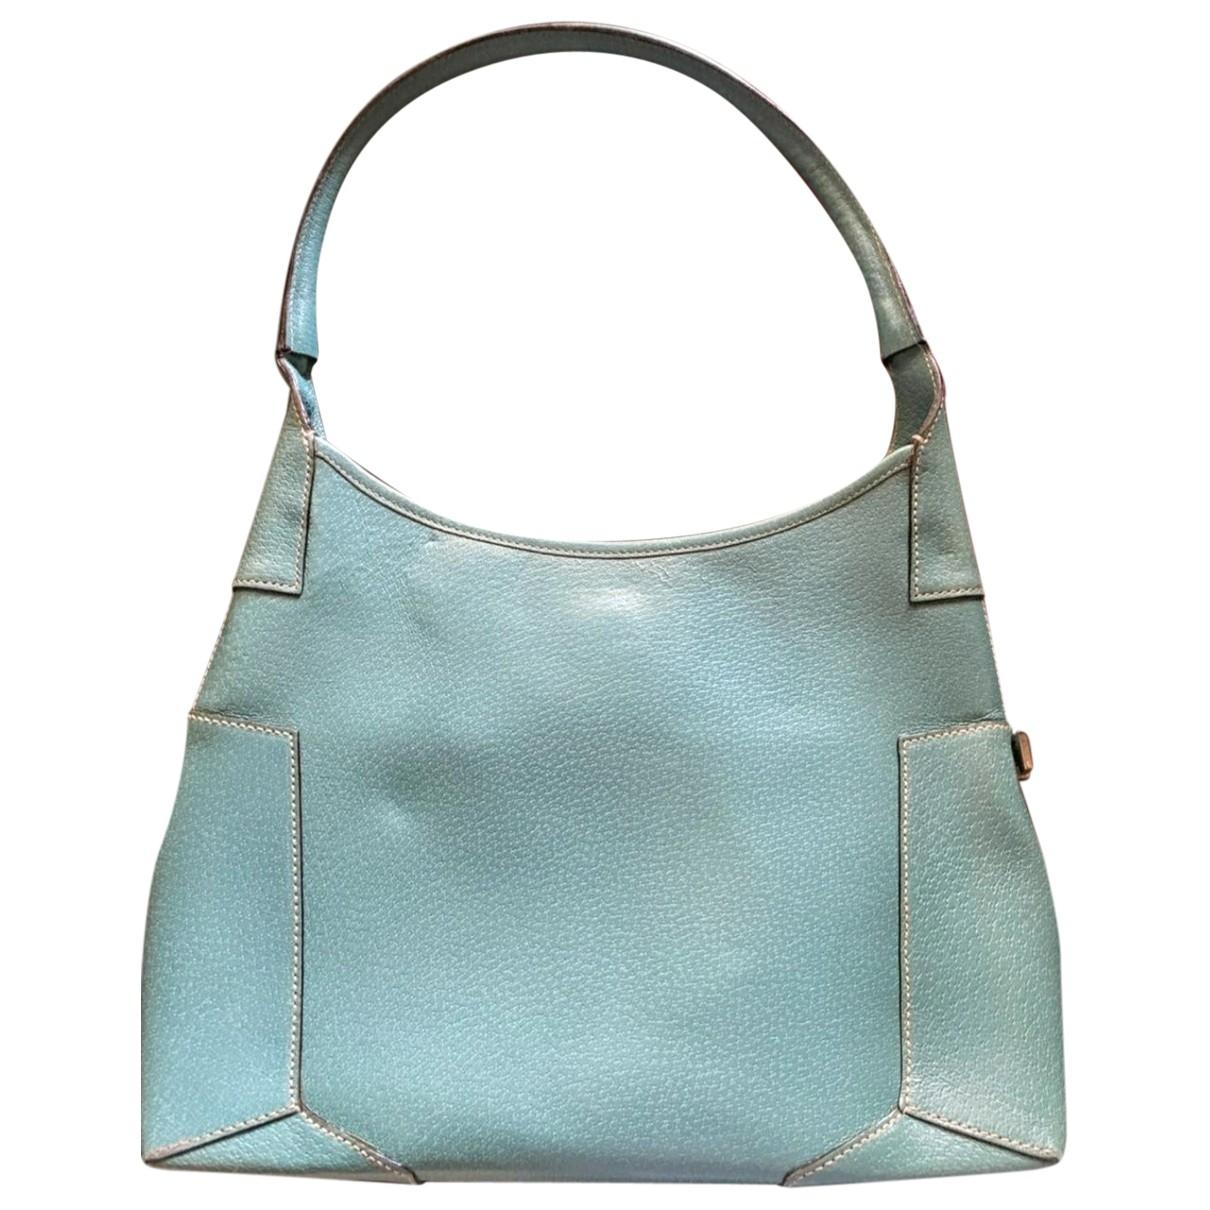 Salvatore Ferragamo \N Turquoise Fur handbag for Women \N